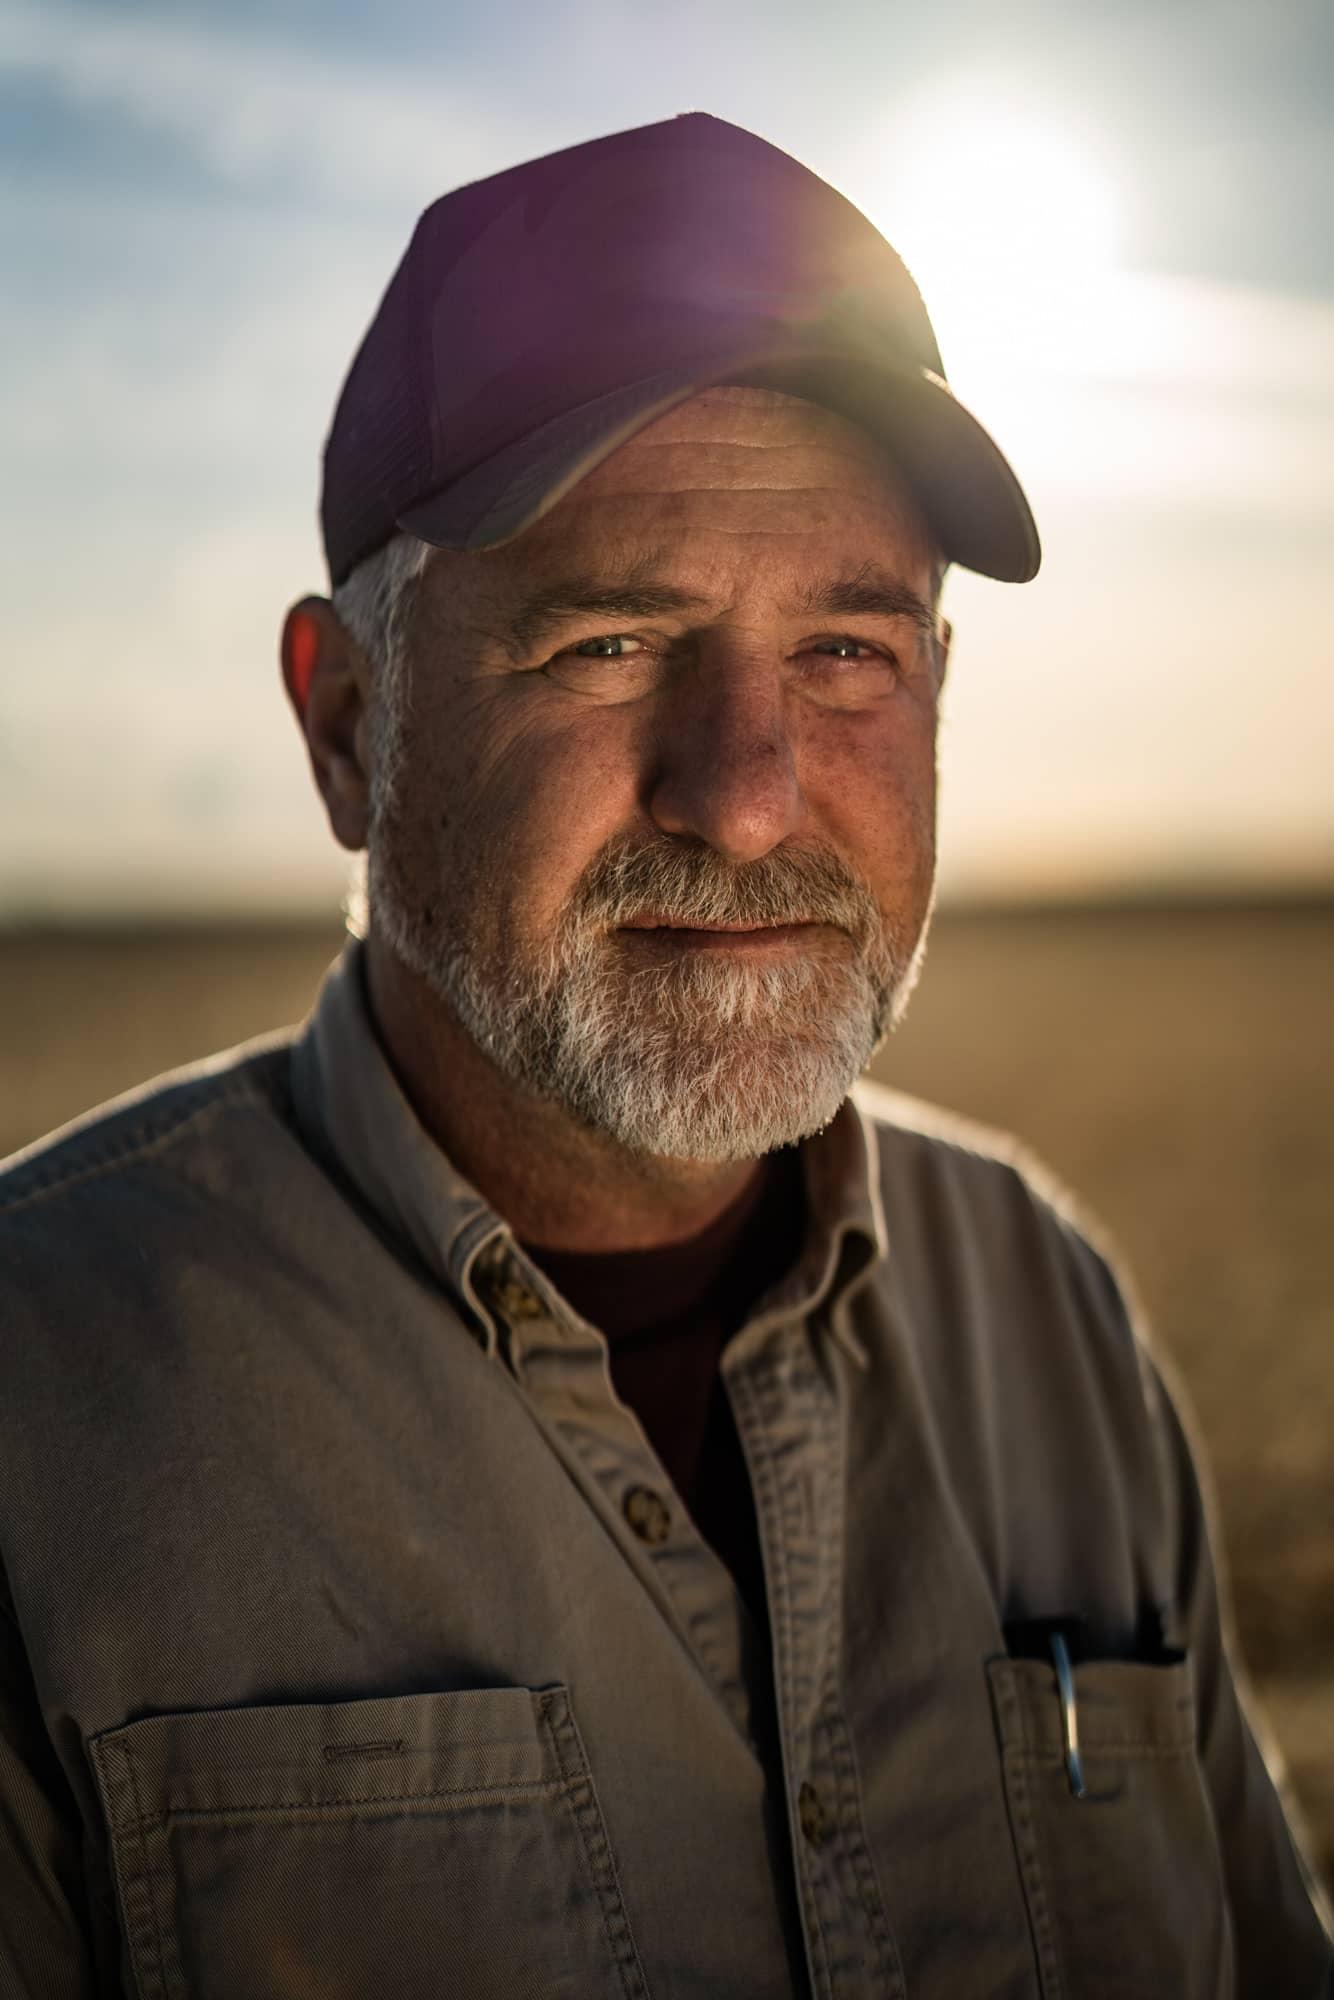 Farmer at Charlotte's Web